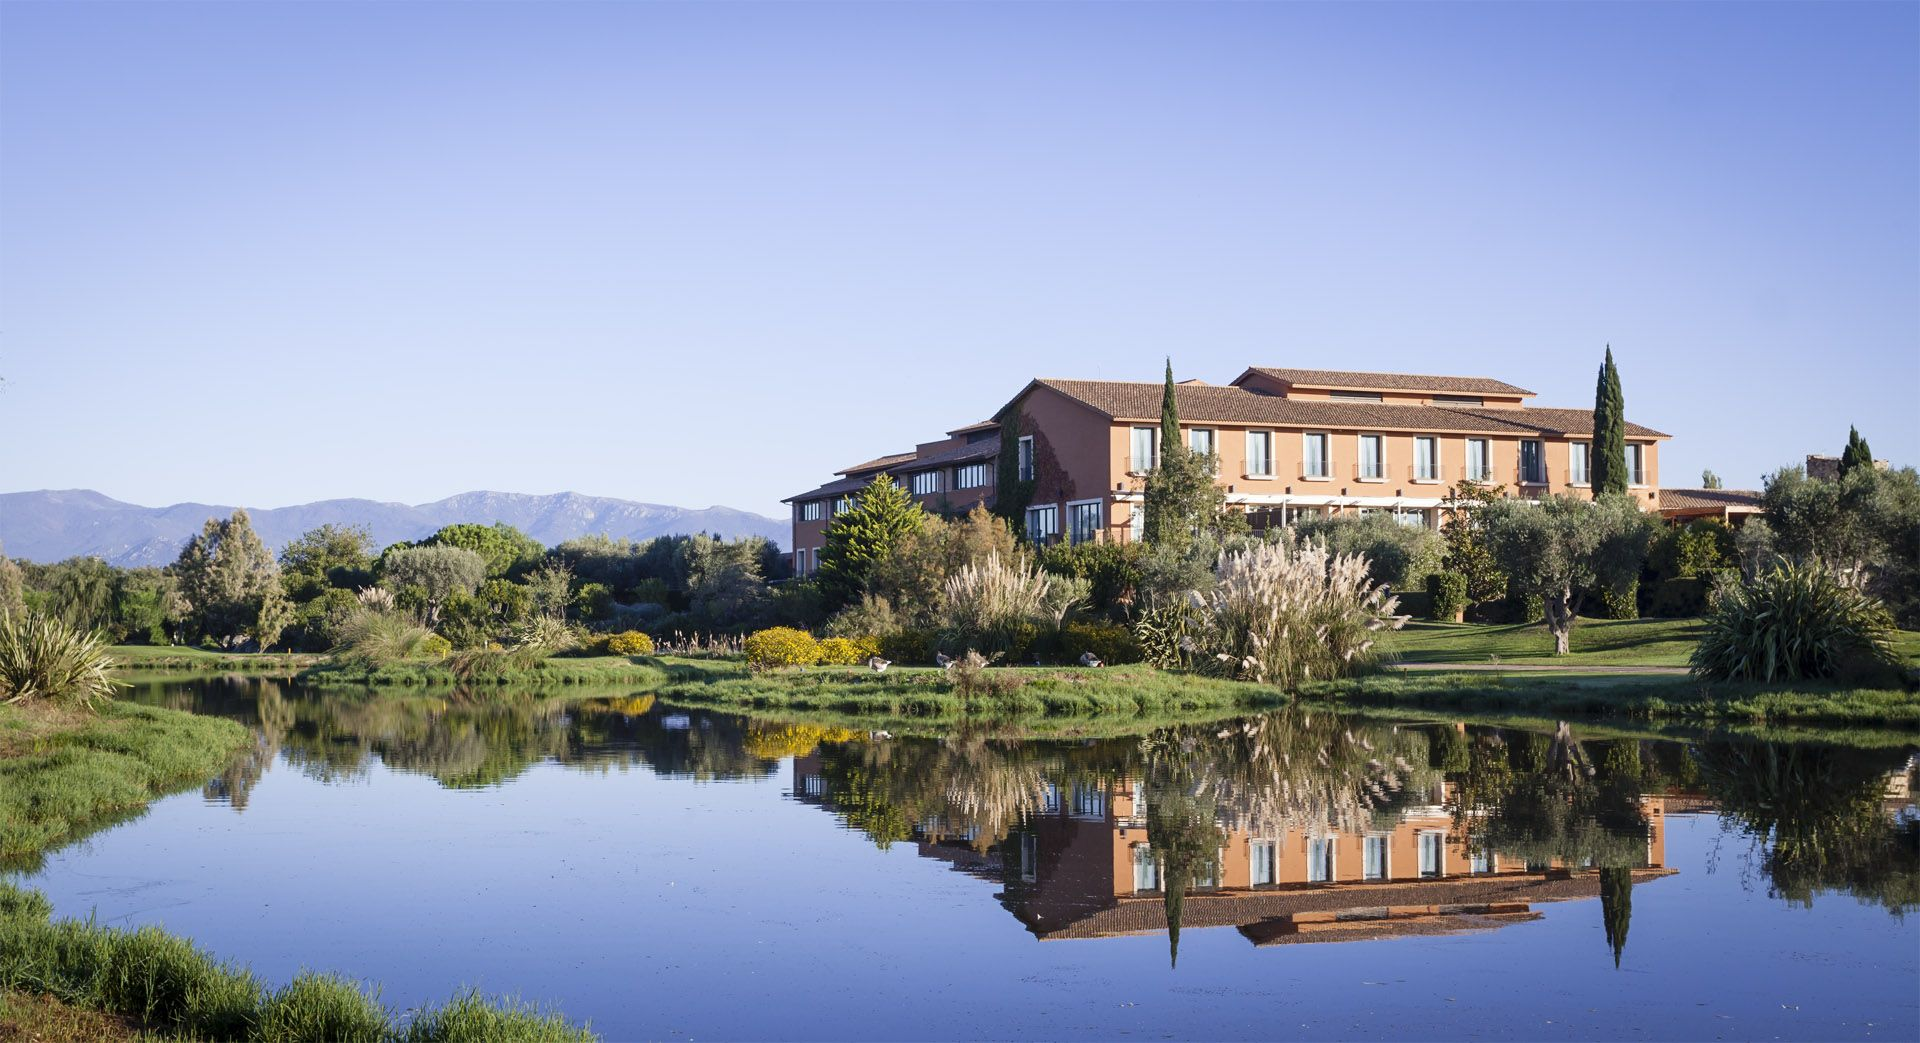 Hotel Peralada 3 - Hotel Peralada Wine Spa & Golf, Girona